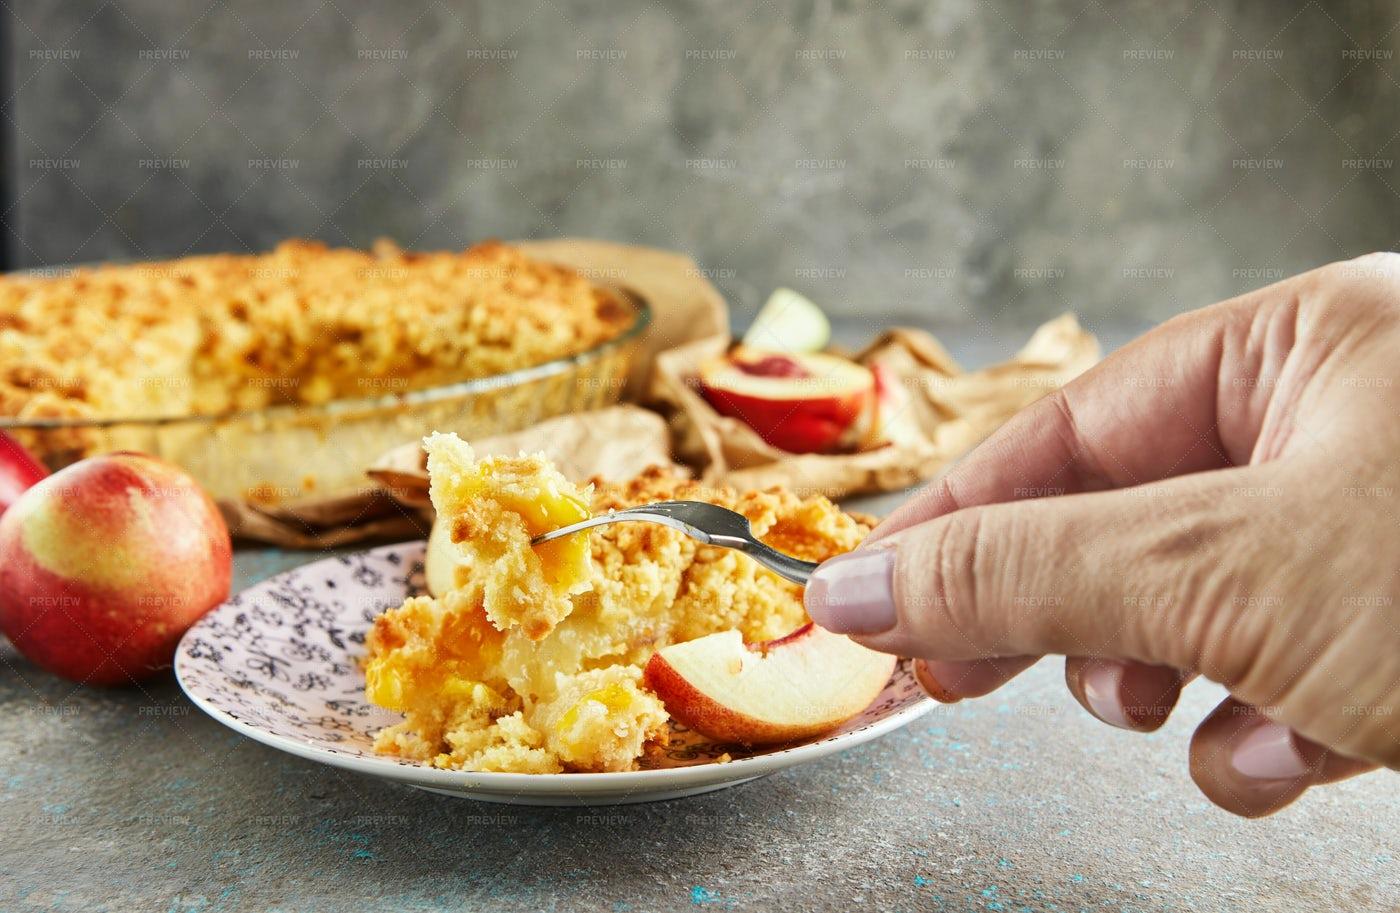 Eating Apple Pie: Stock Photos